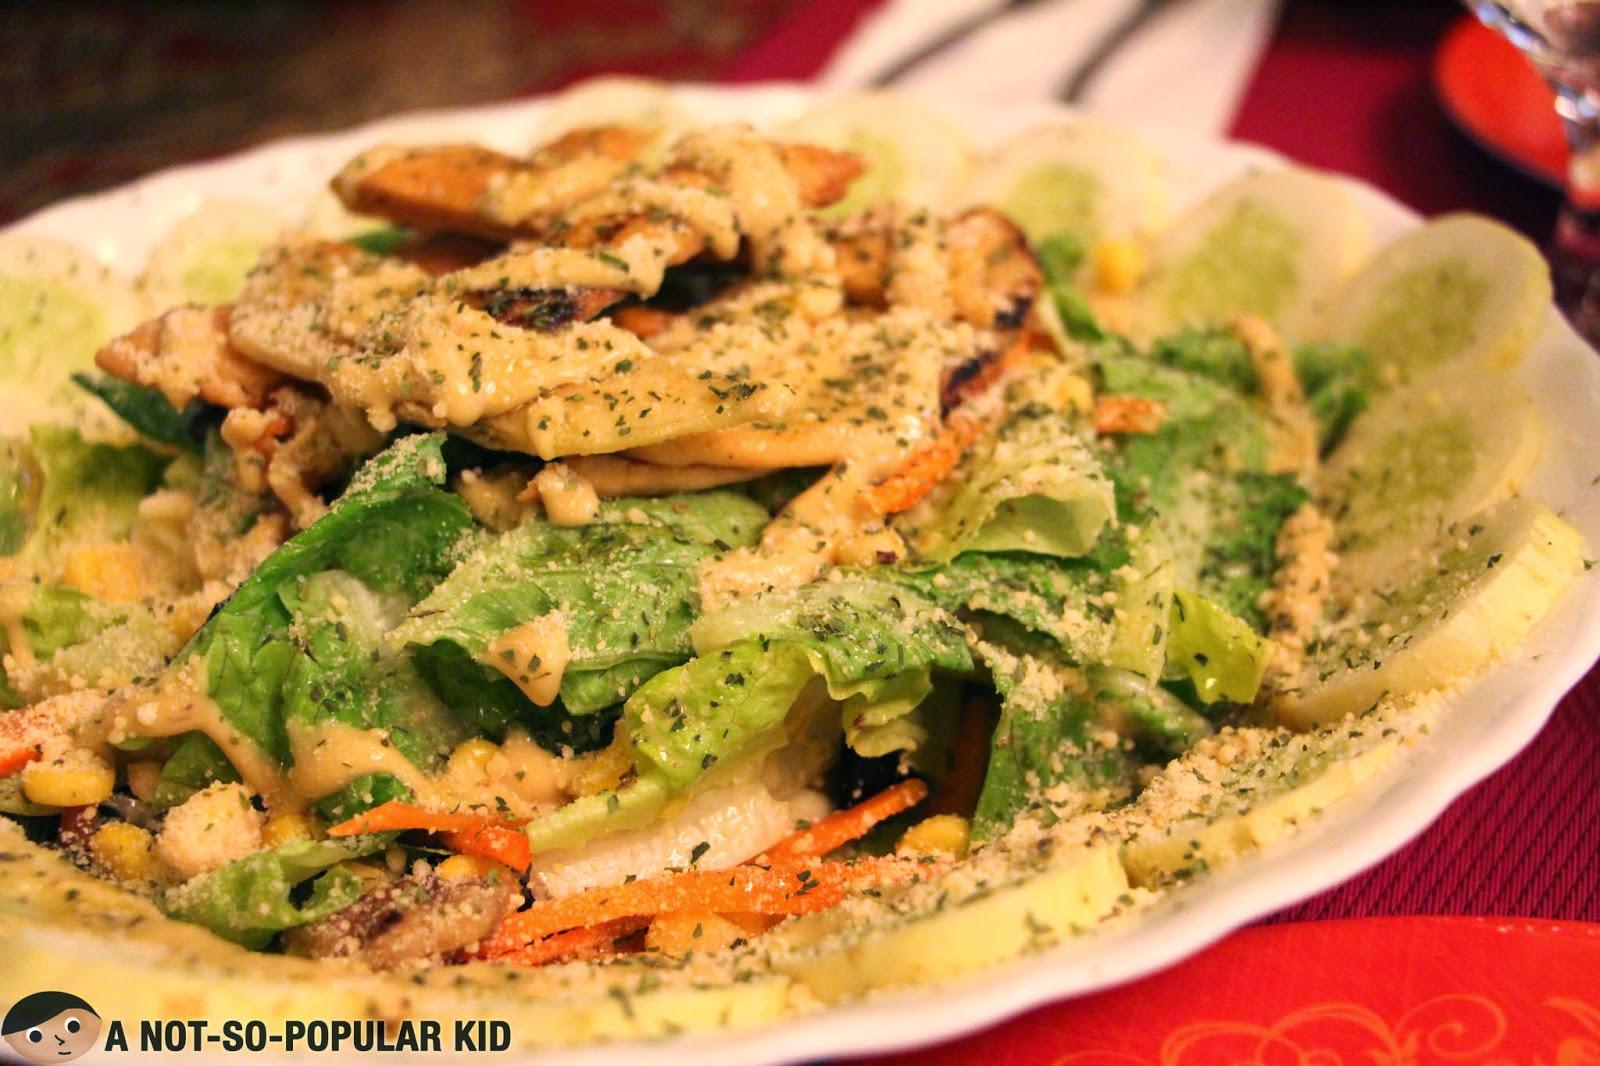 The refreshing but plain Arya Salad of Arya Persian Restaurant